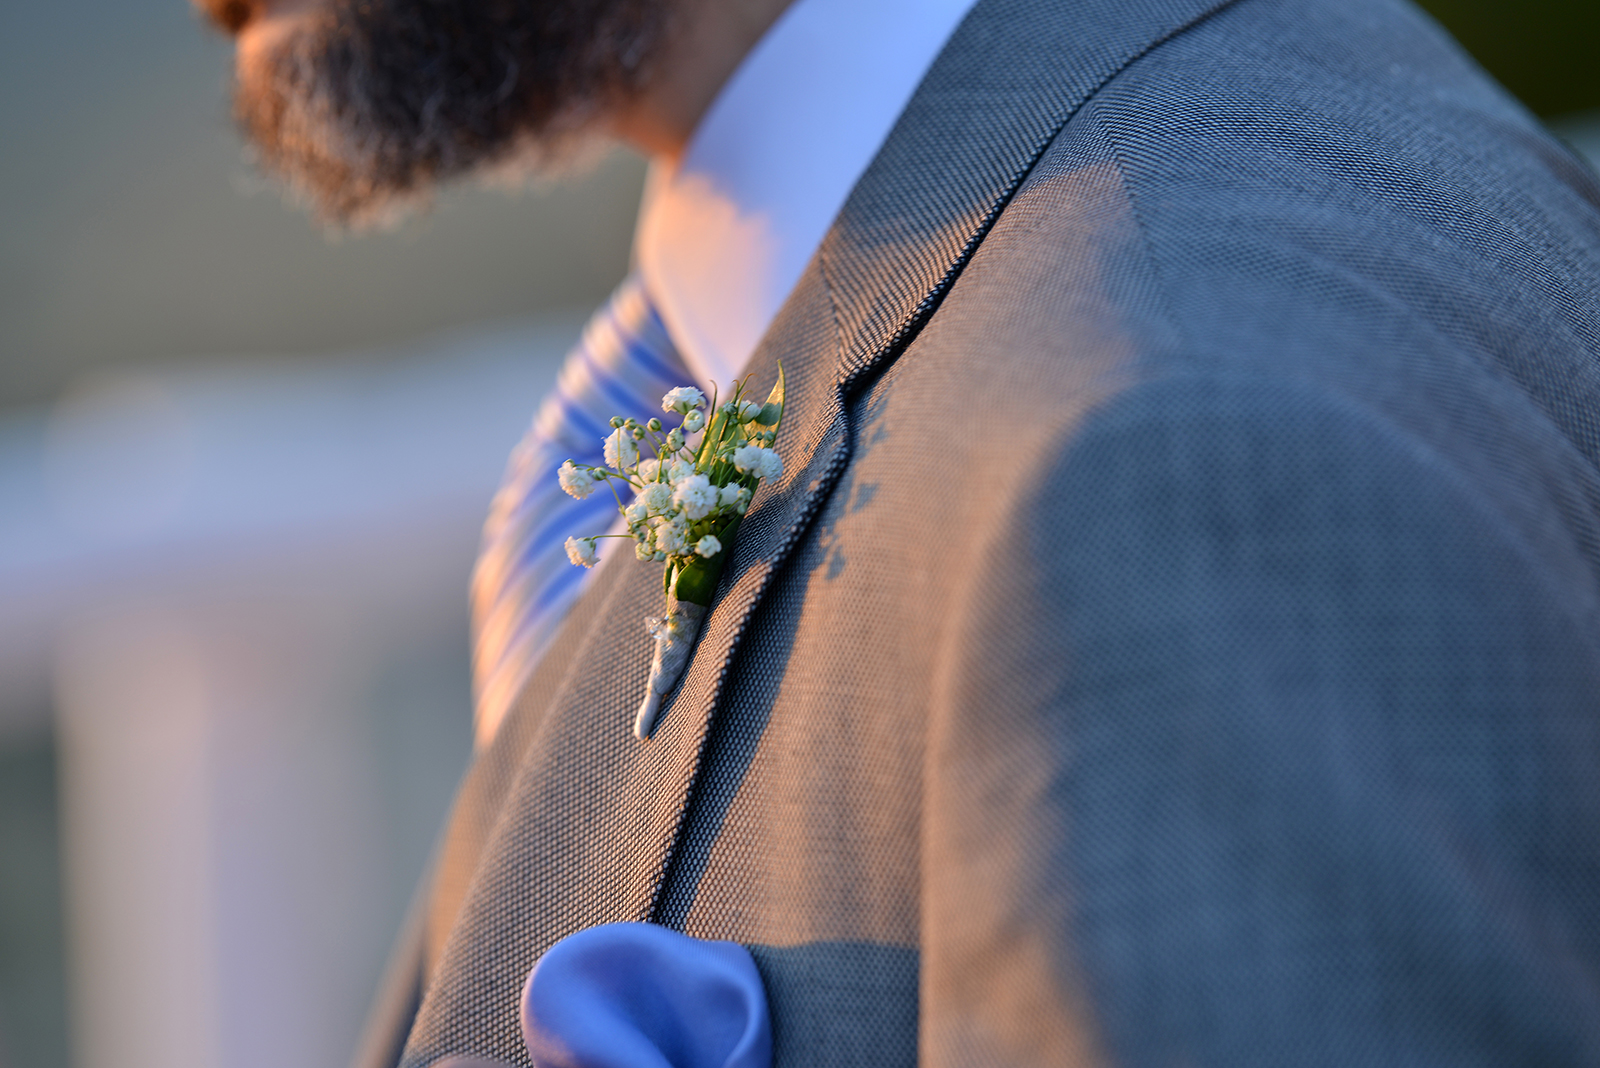 Wedding 0025 Polydefkis Stathopolous